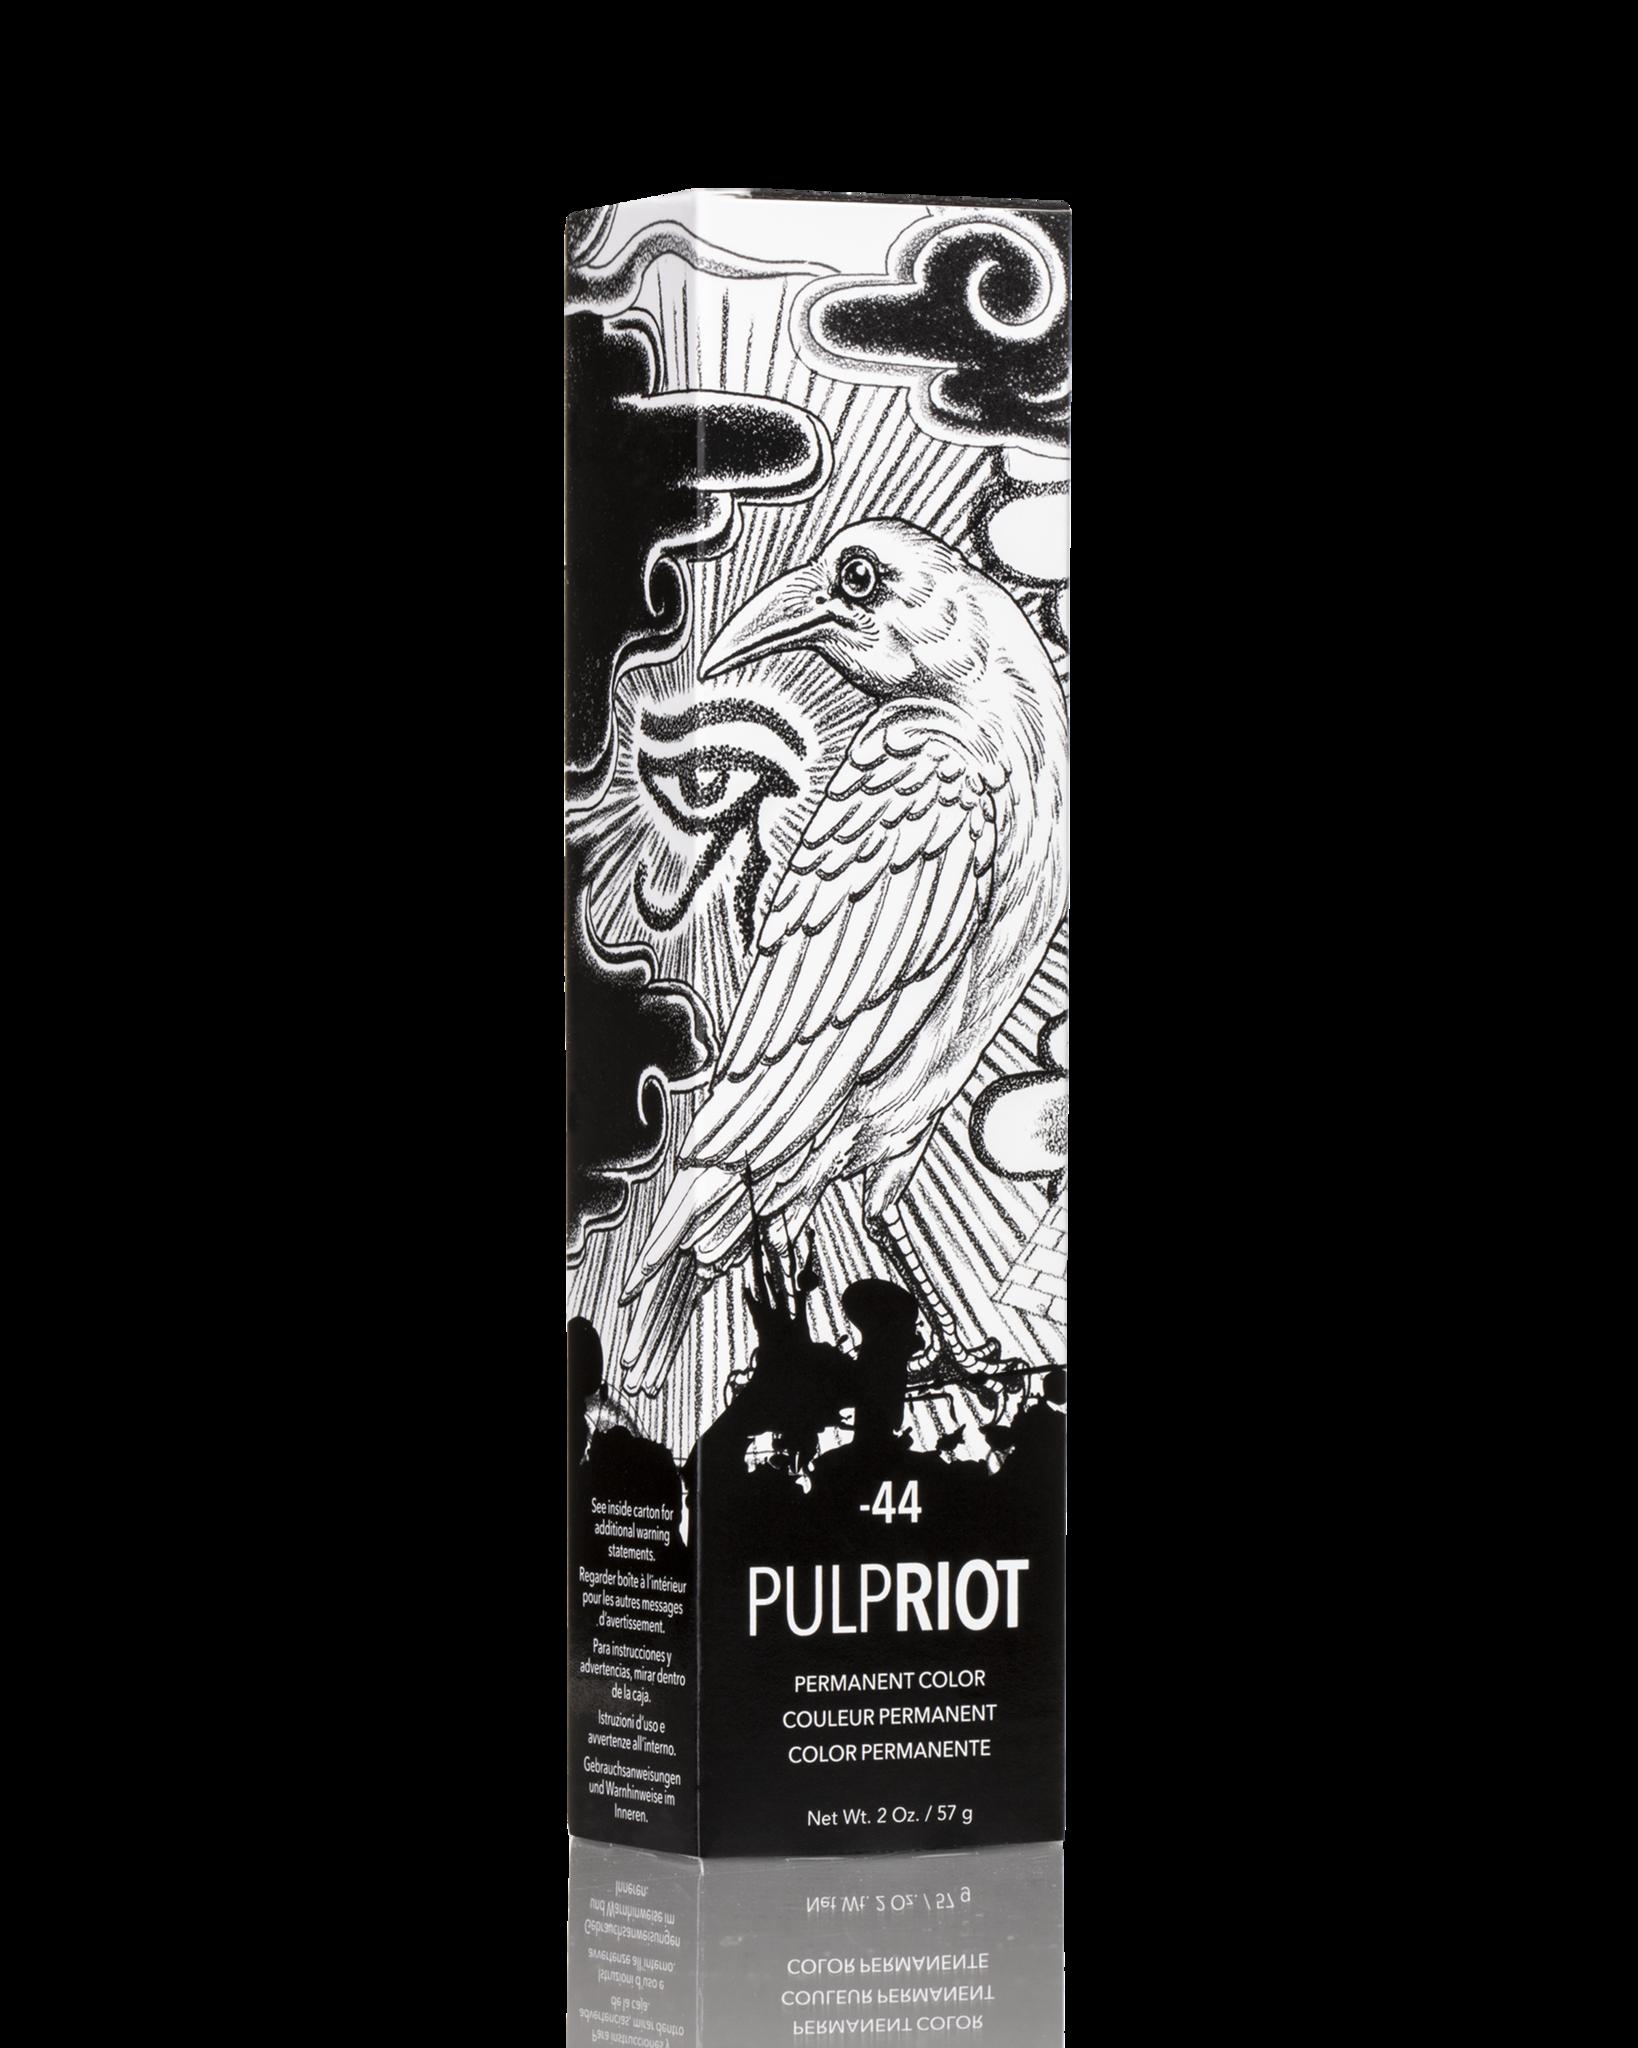 Pulp Riot PULP RIOT FACTION 8 BOOSTER -44